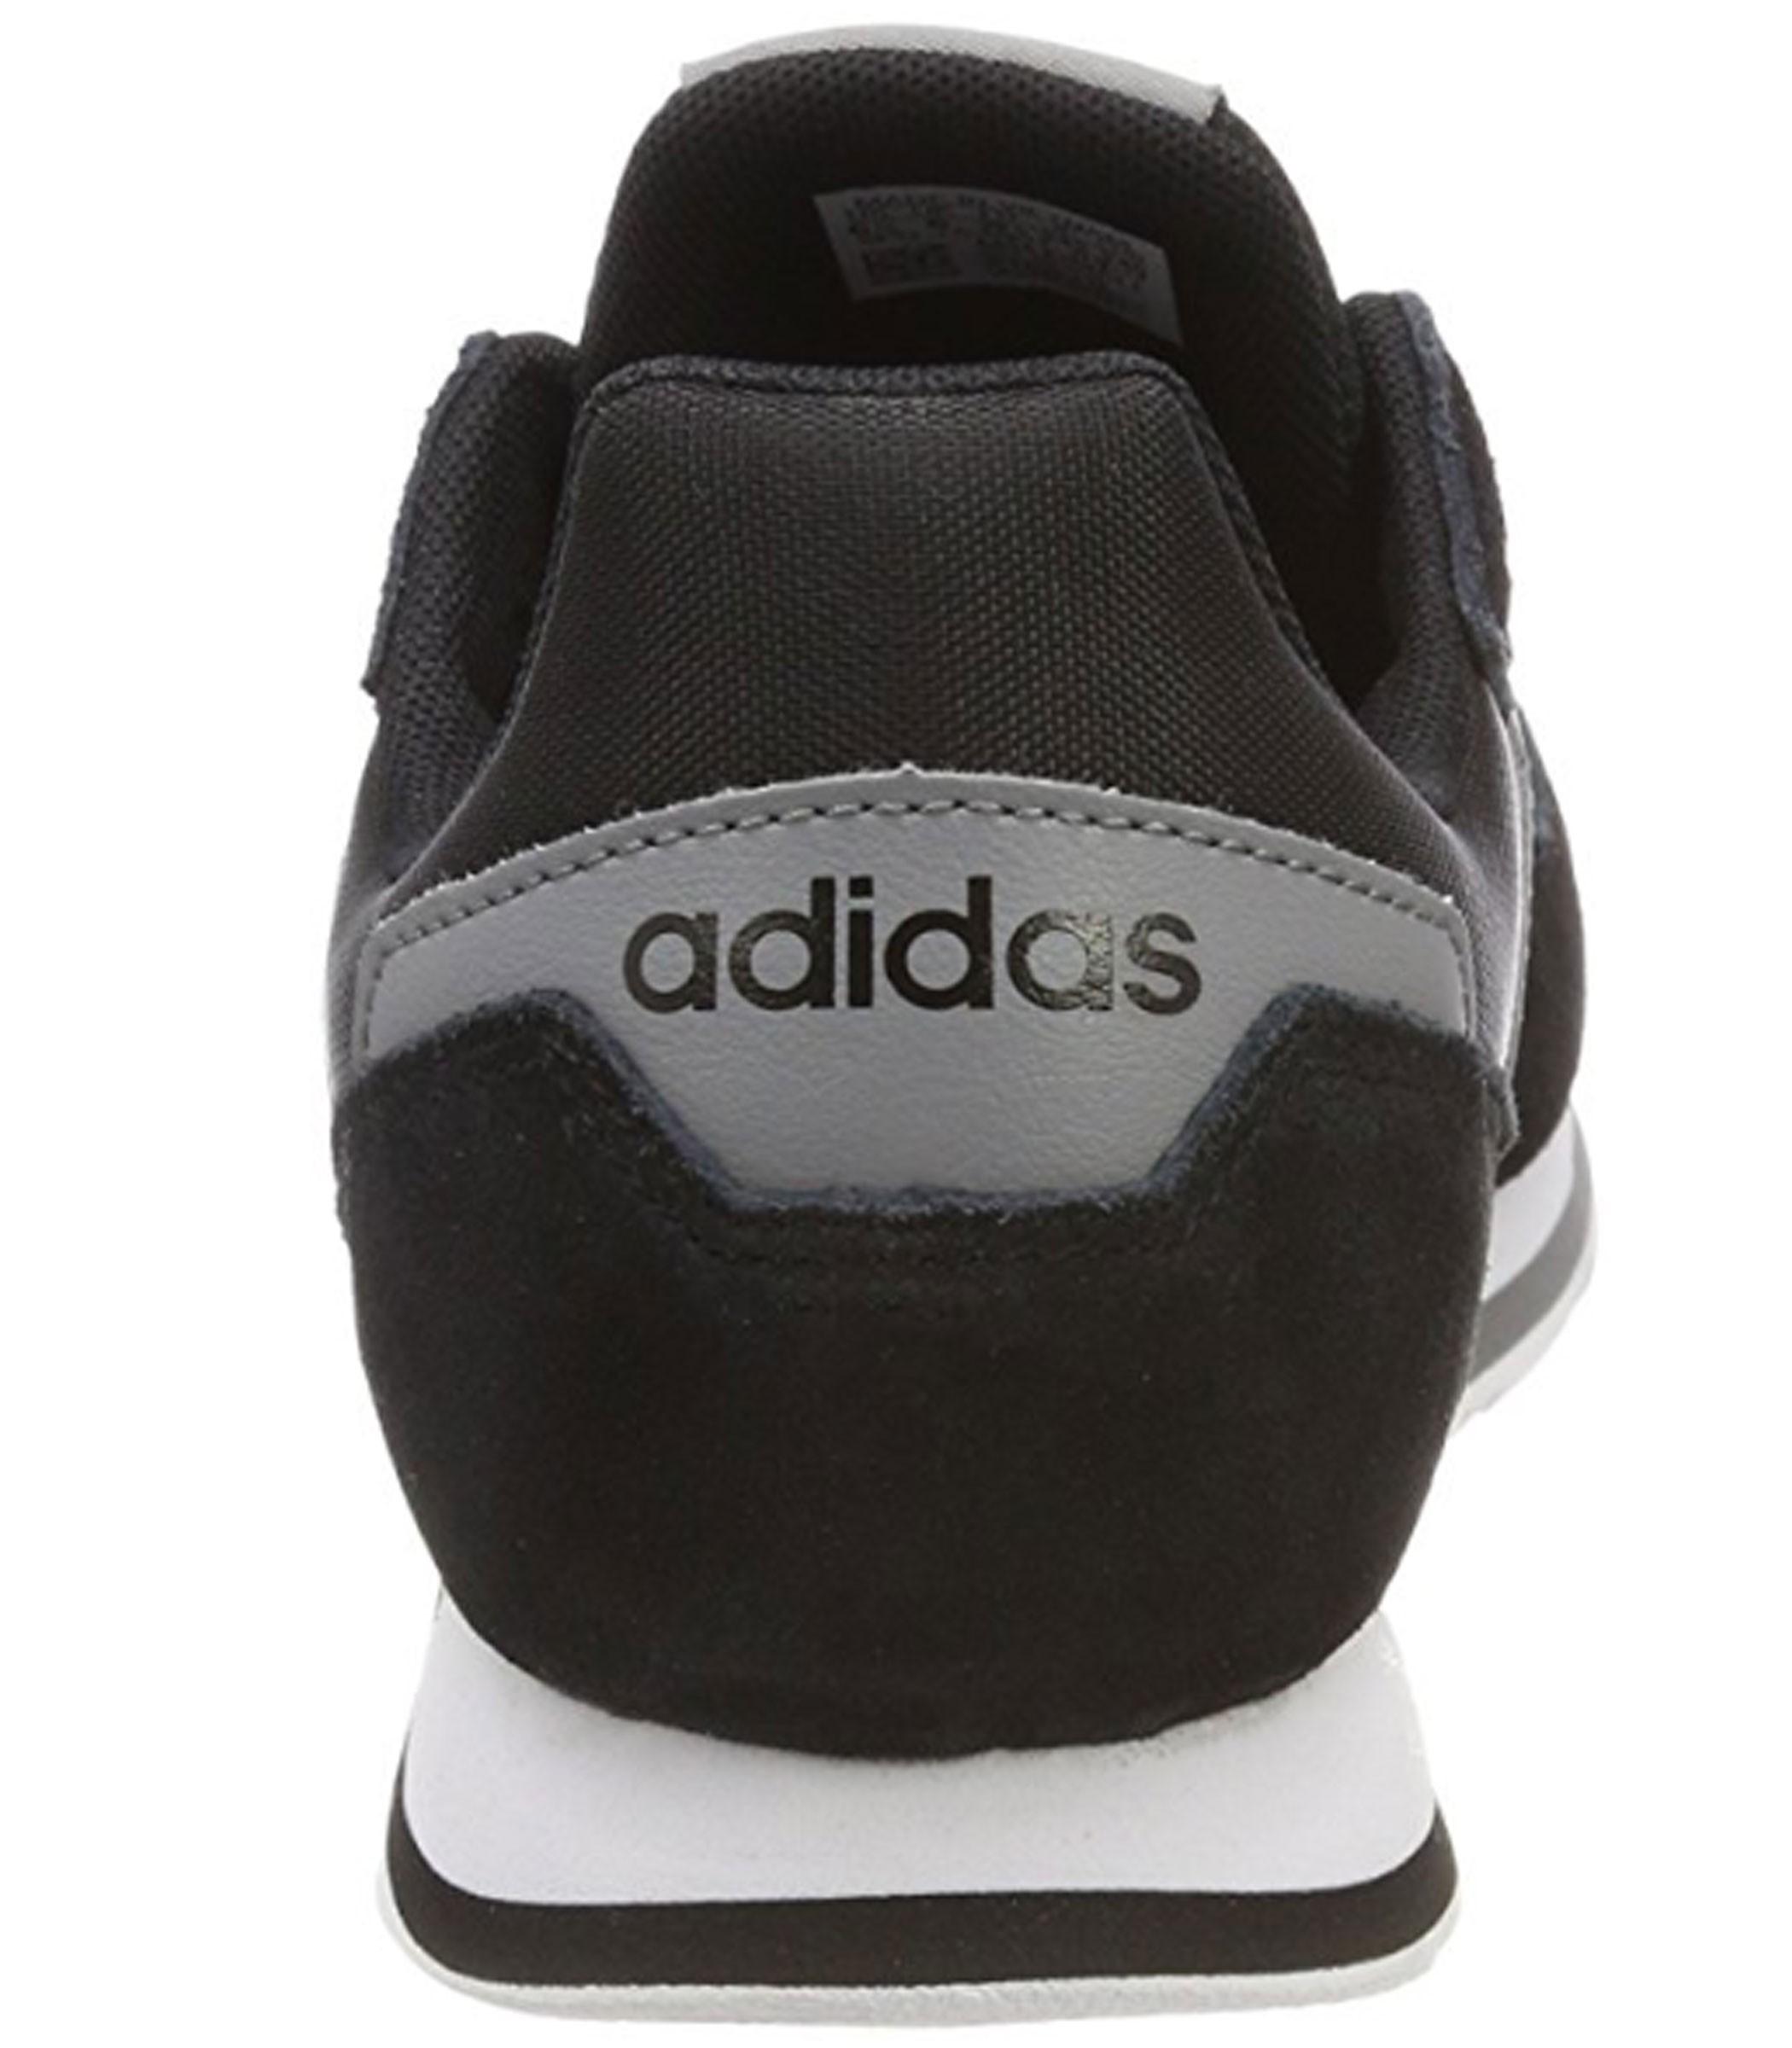 premium selection f6a10 c1a6f Scarpe Running Adidas 8k - Uomo rif. DB1728